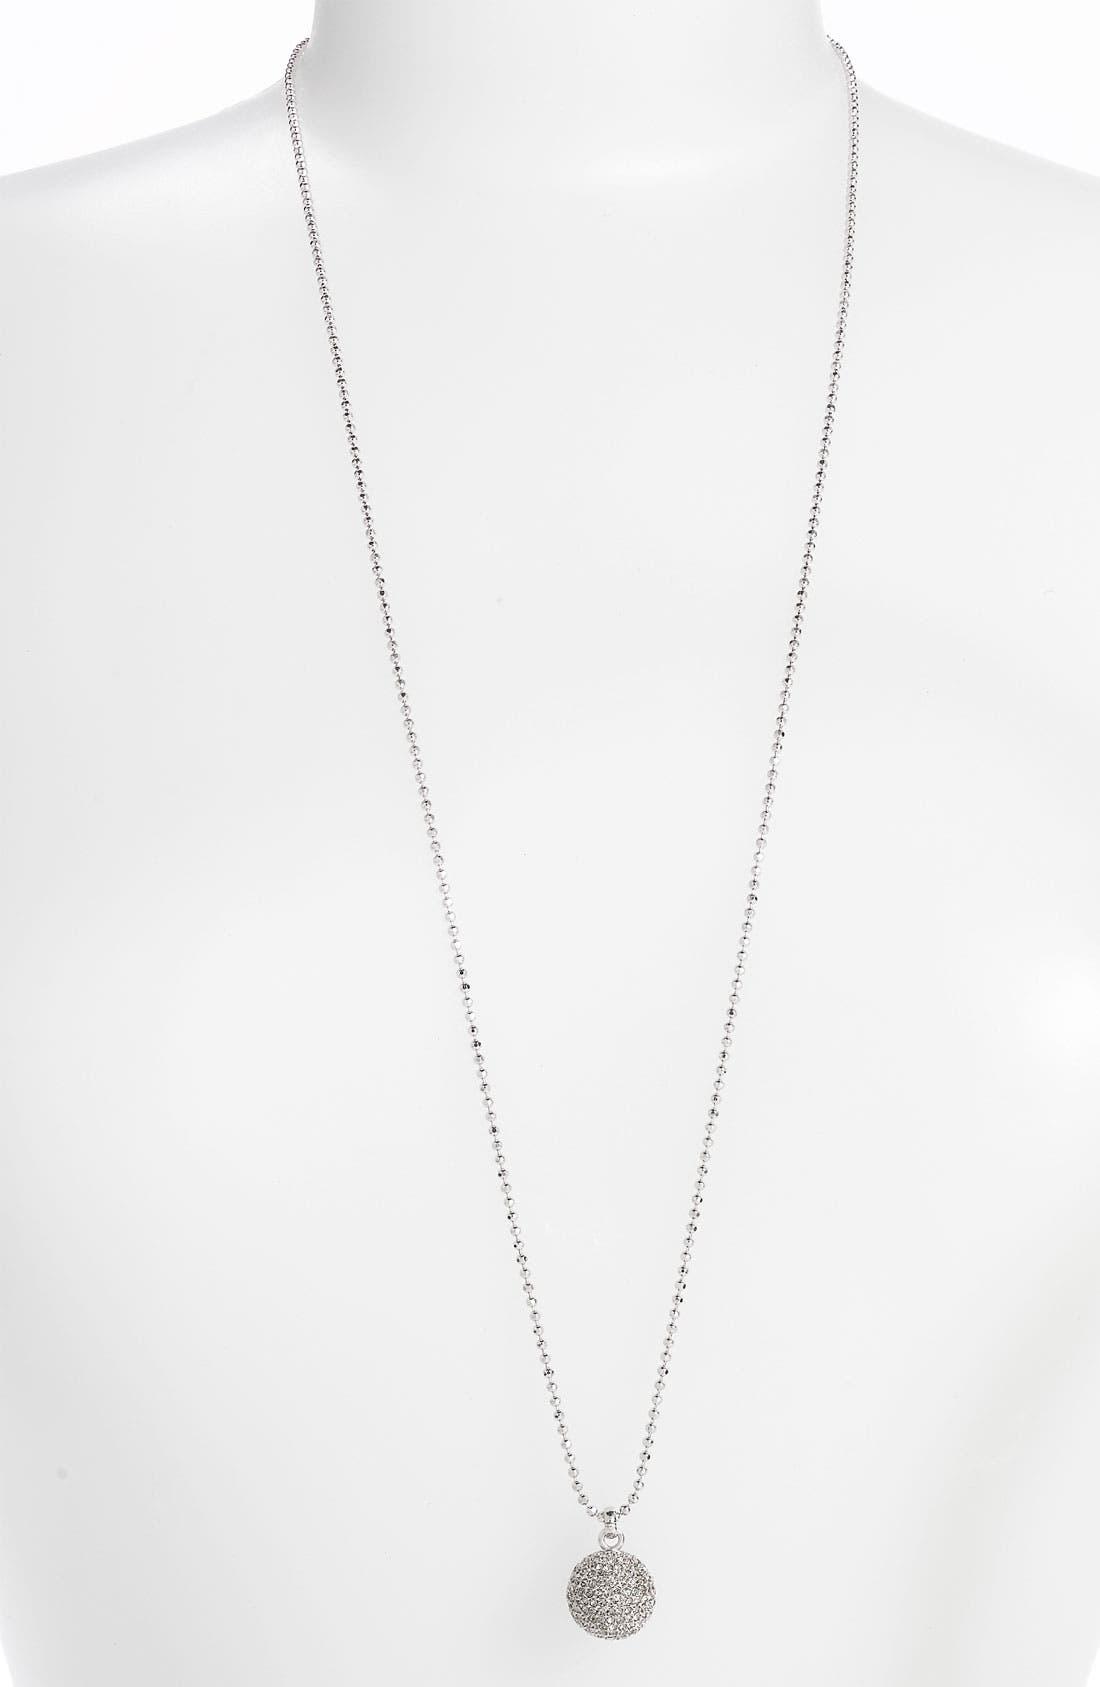 Main Image - Michael Kors Pavé Ball Long Necklace